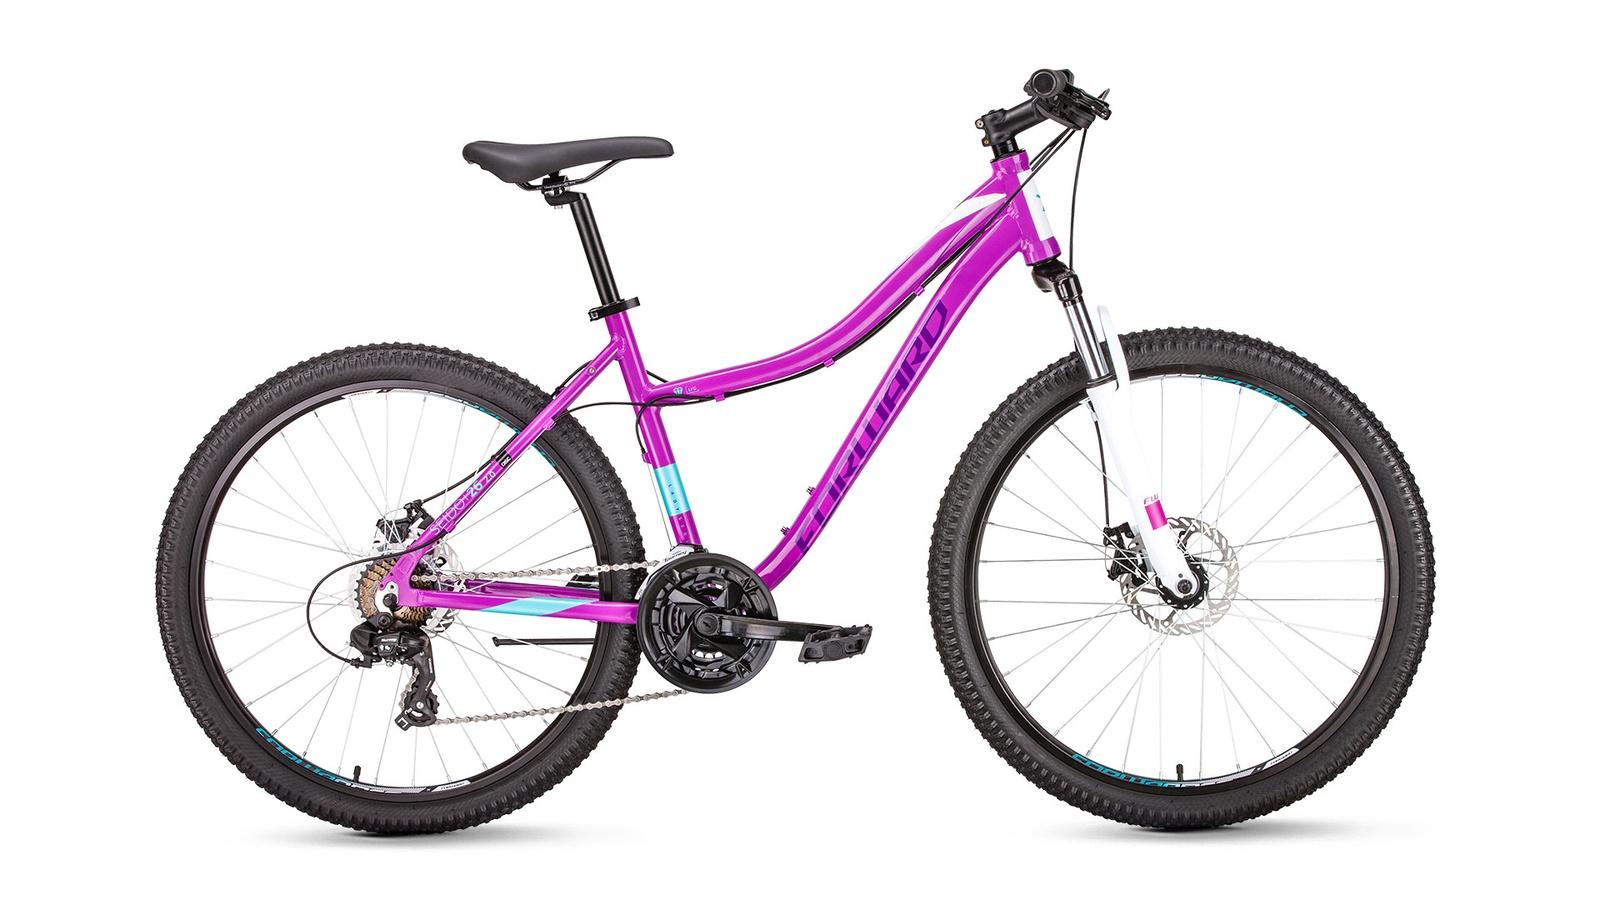 Велосипед Forward Seido 26 2.0 disc, фиолетовый велосипед giant rove disc lite 2016